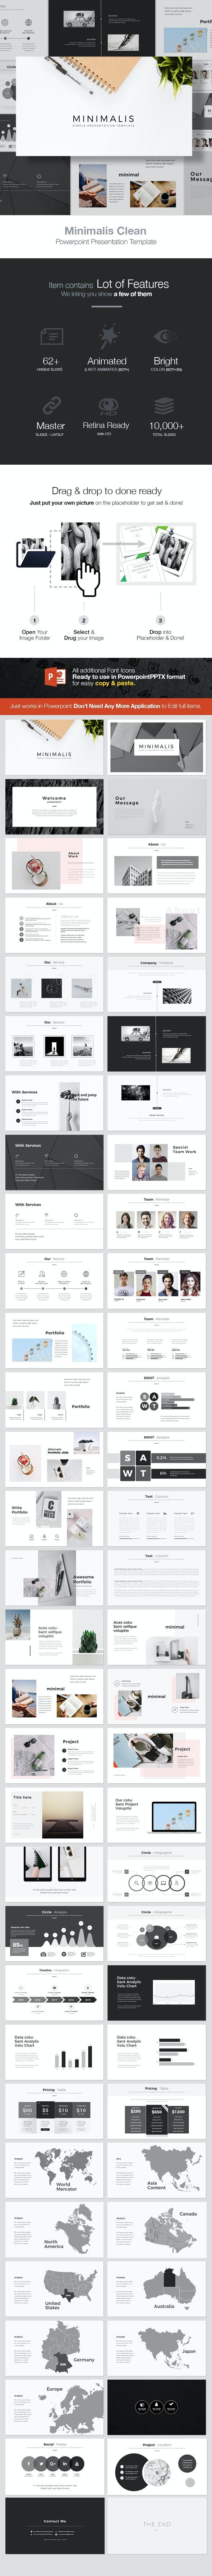 Minimalis Powerpoint Template - Creative PowerPoint Templates